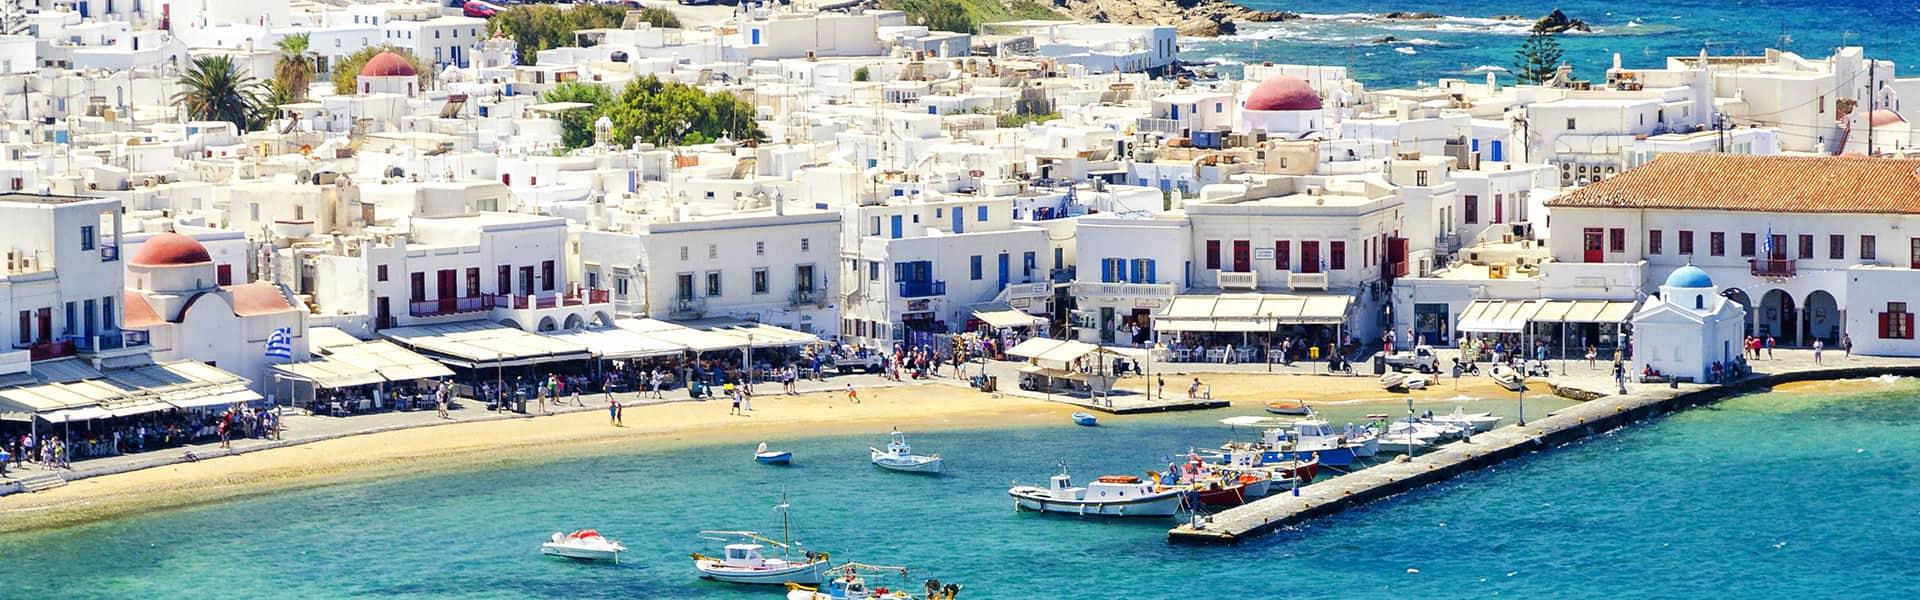 Greek Isles: Santorini, Mykonos & Israel